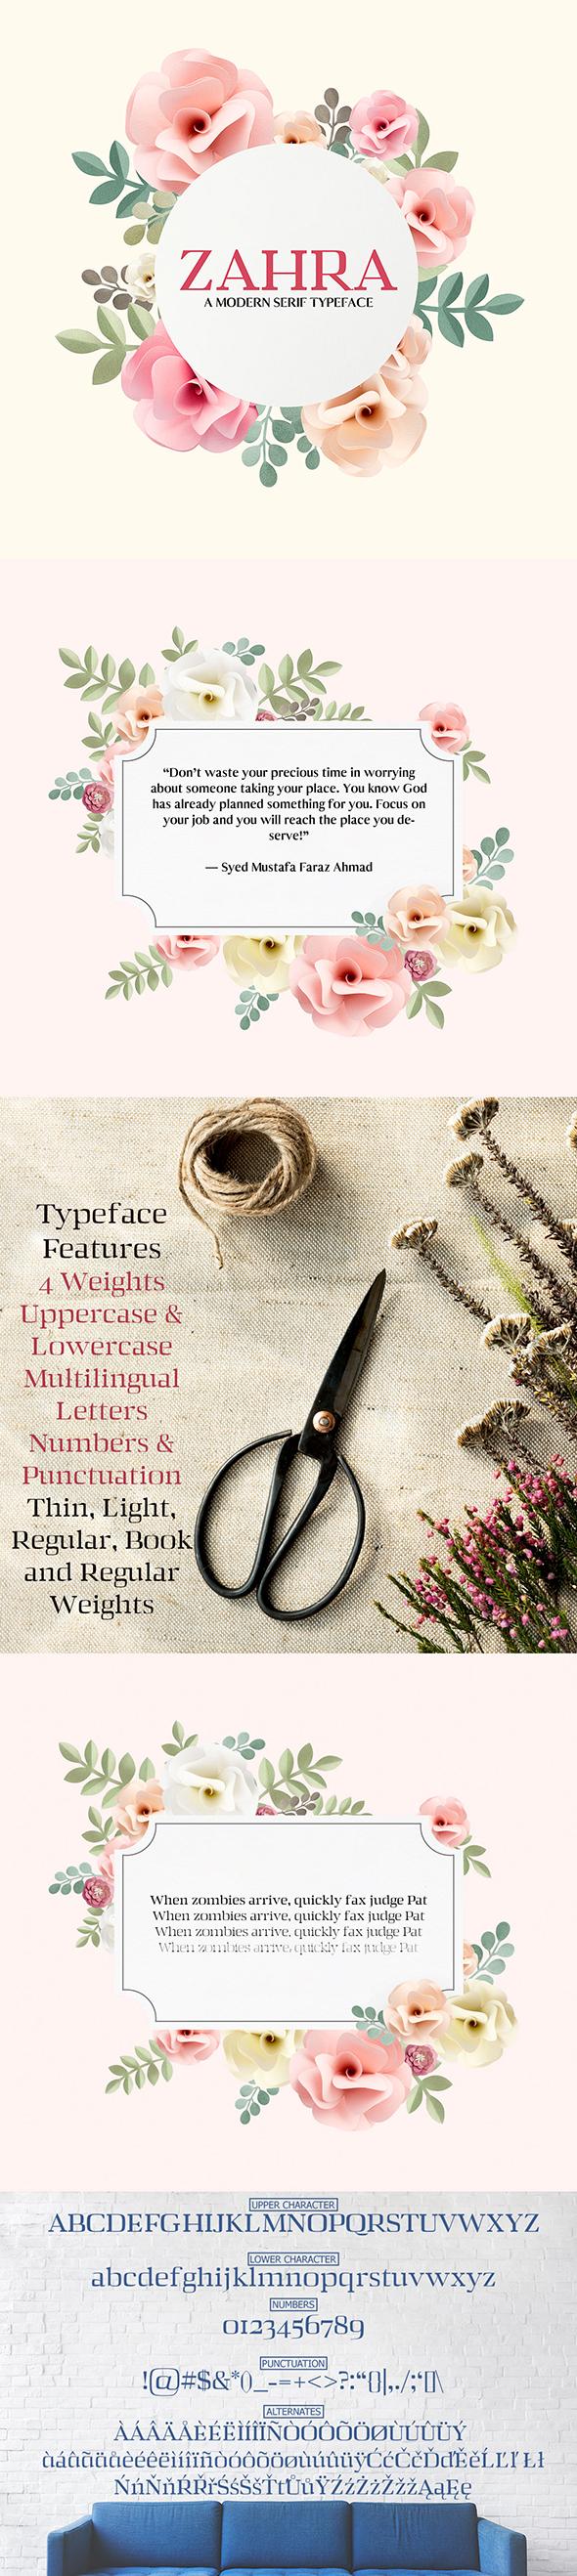 Zahra Serif Typeface - Serif Fonts